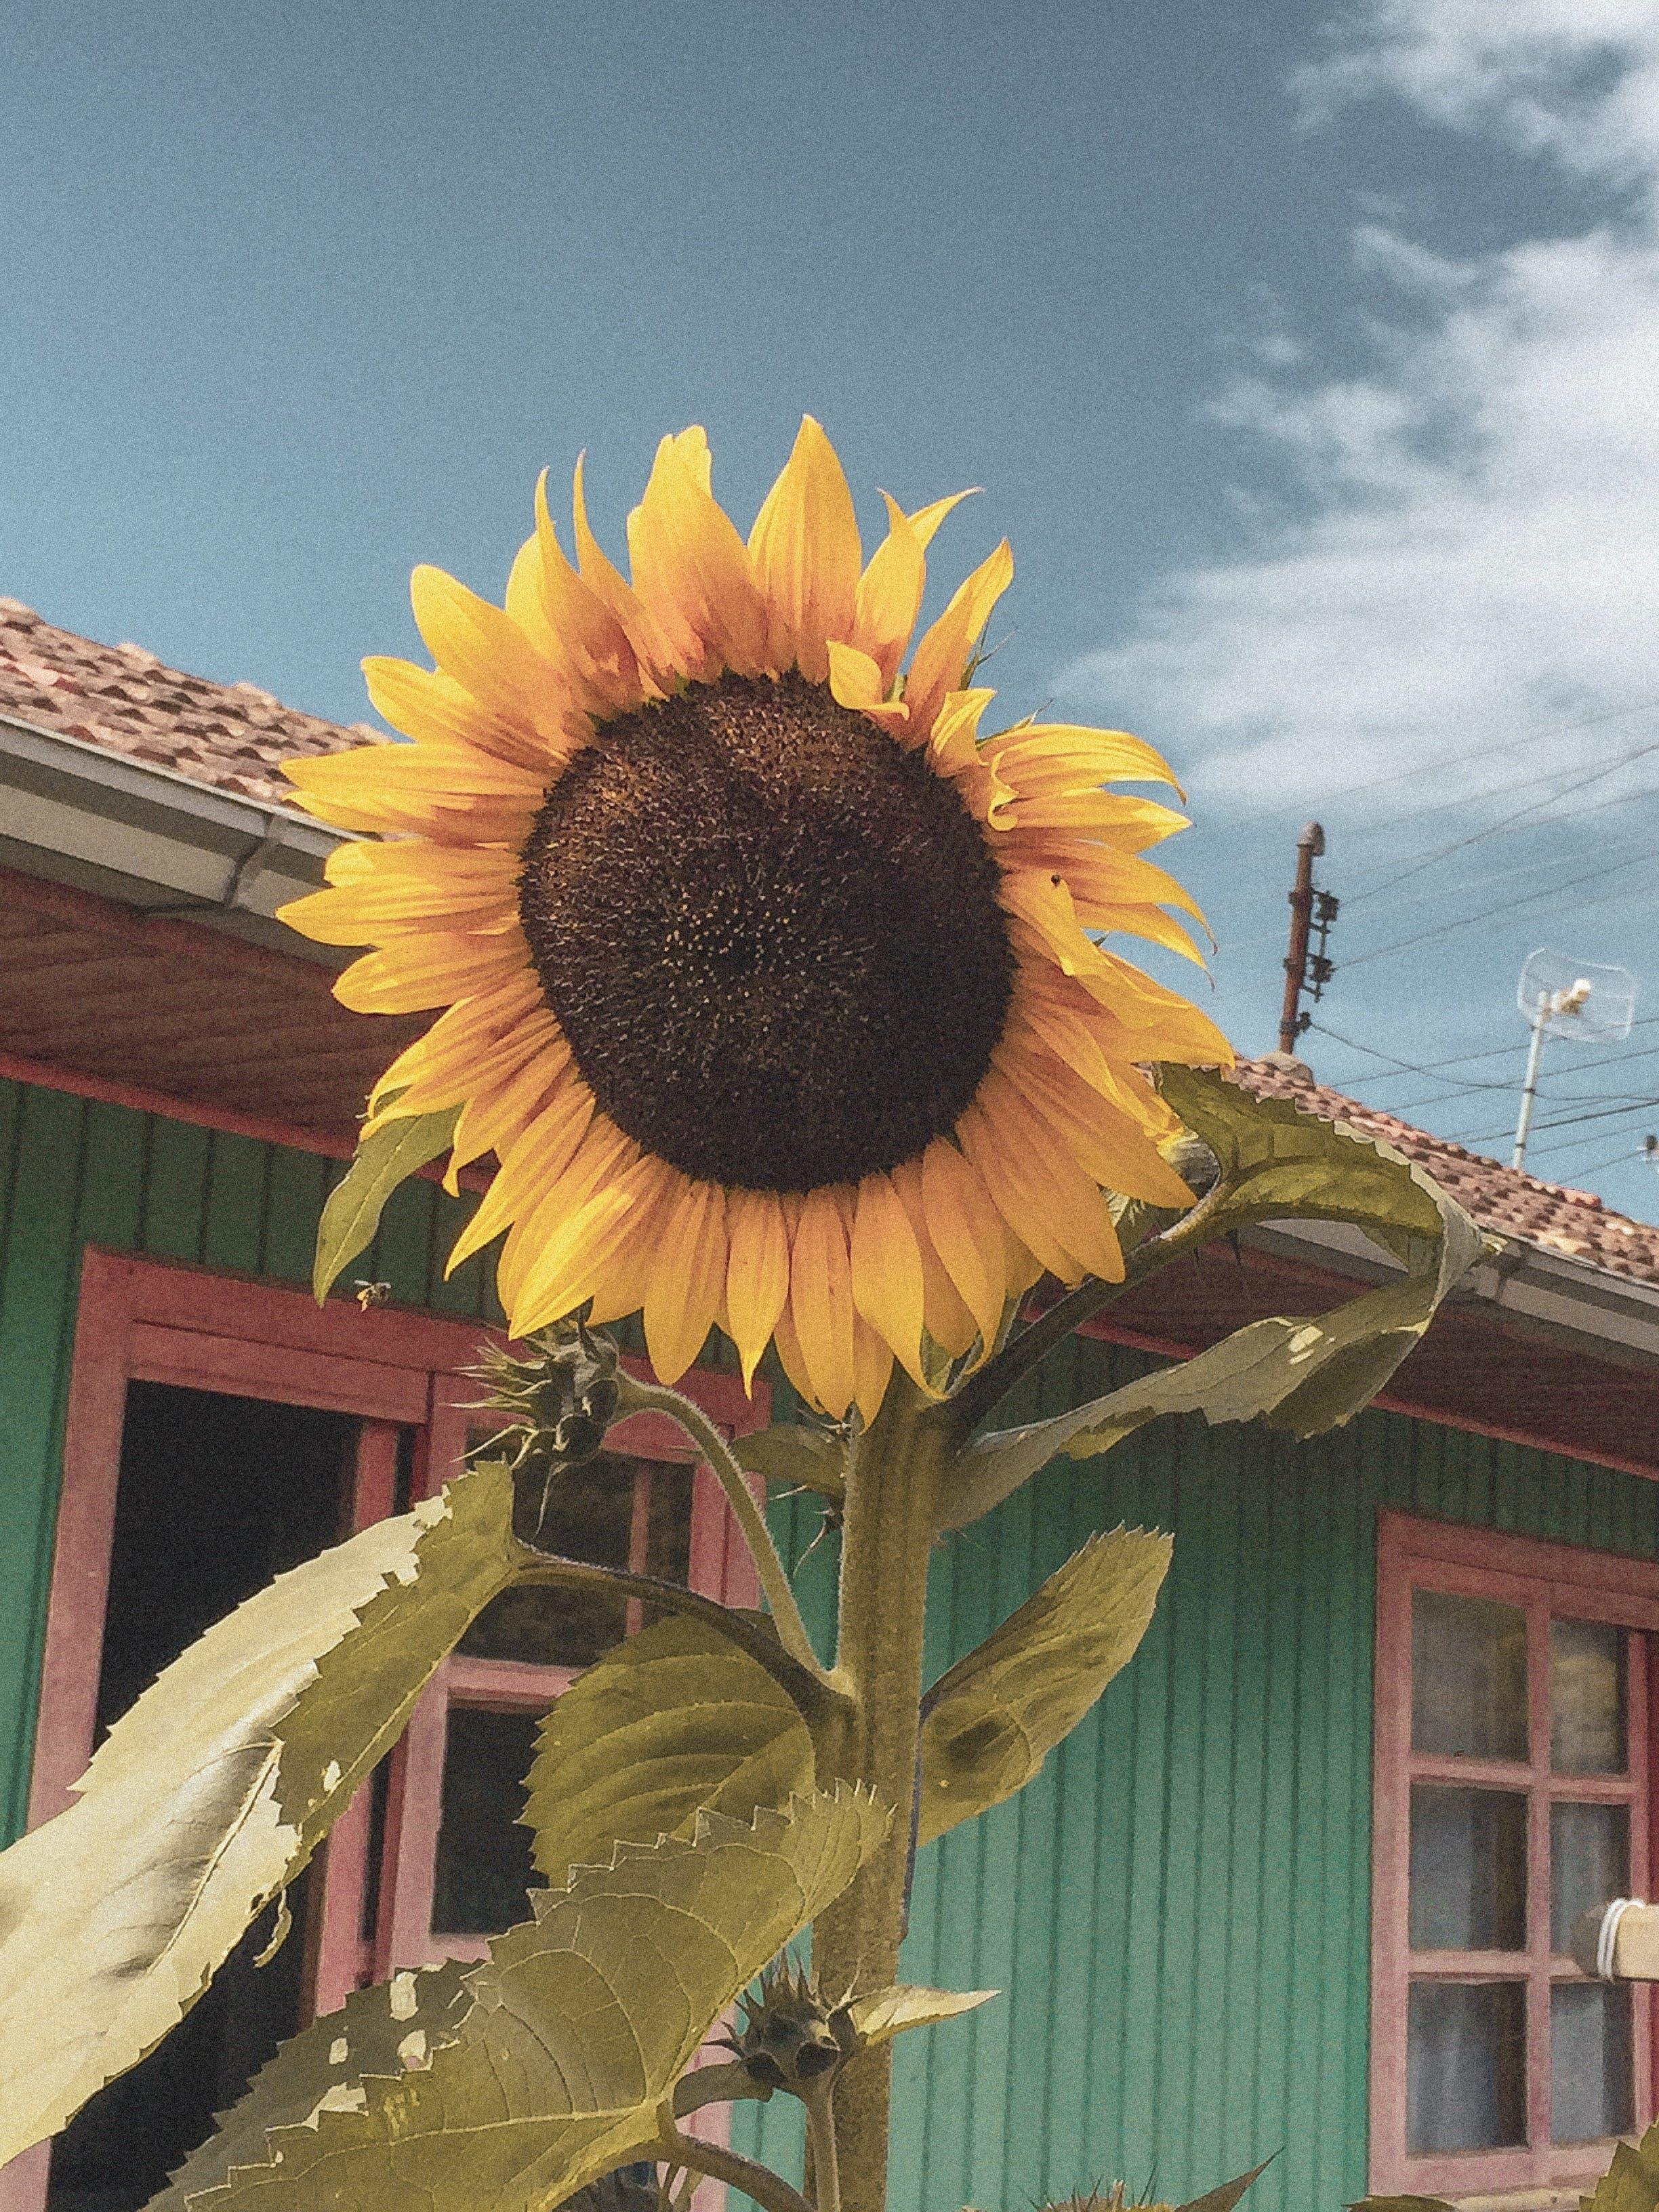 Free stock photo of flower, sunflower